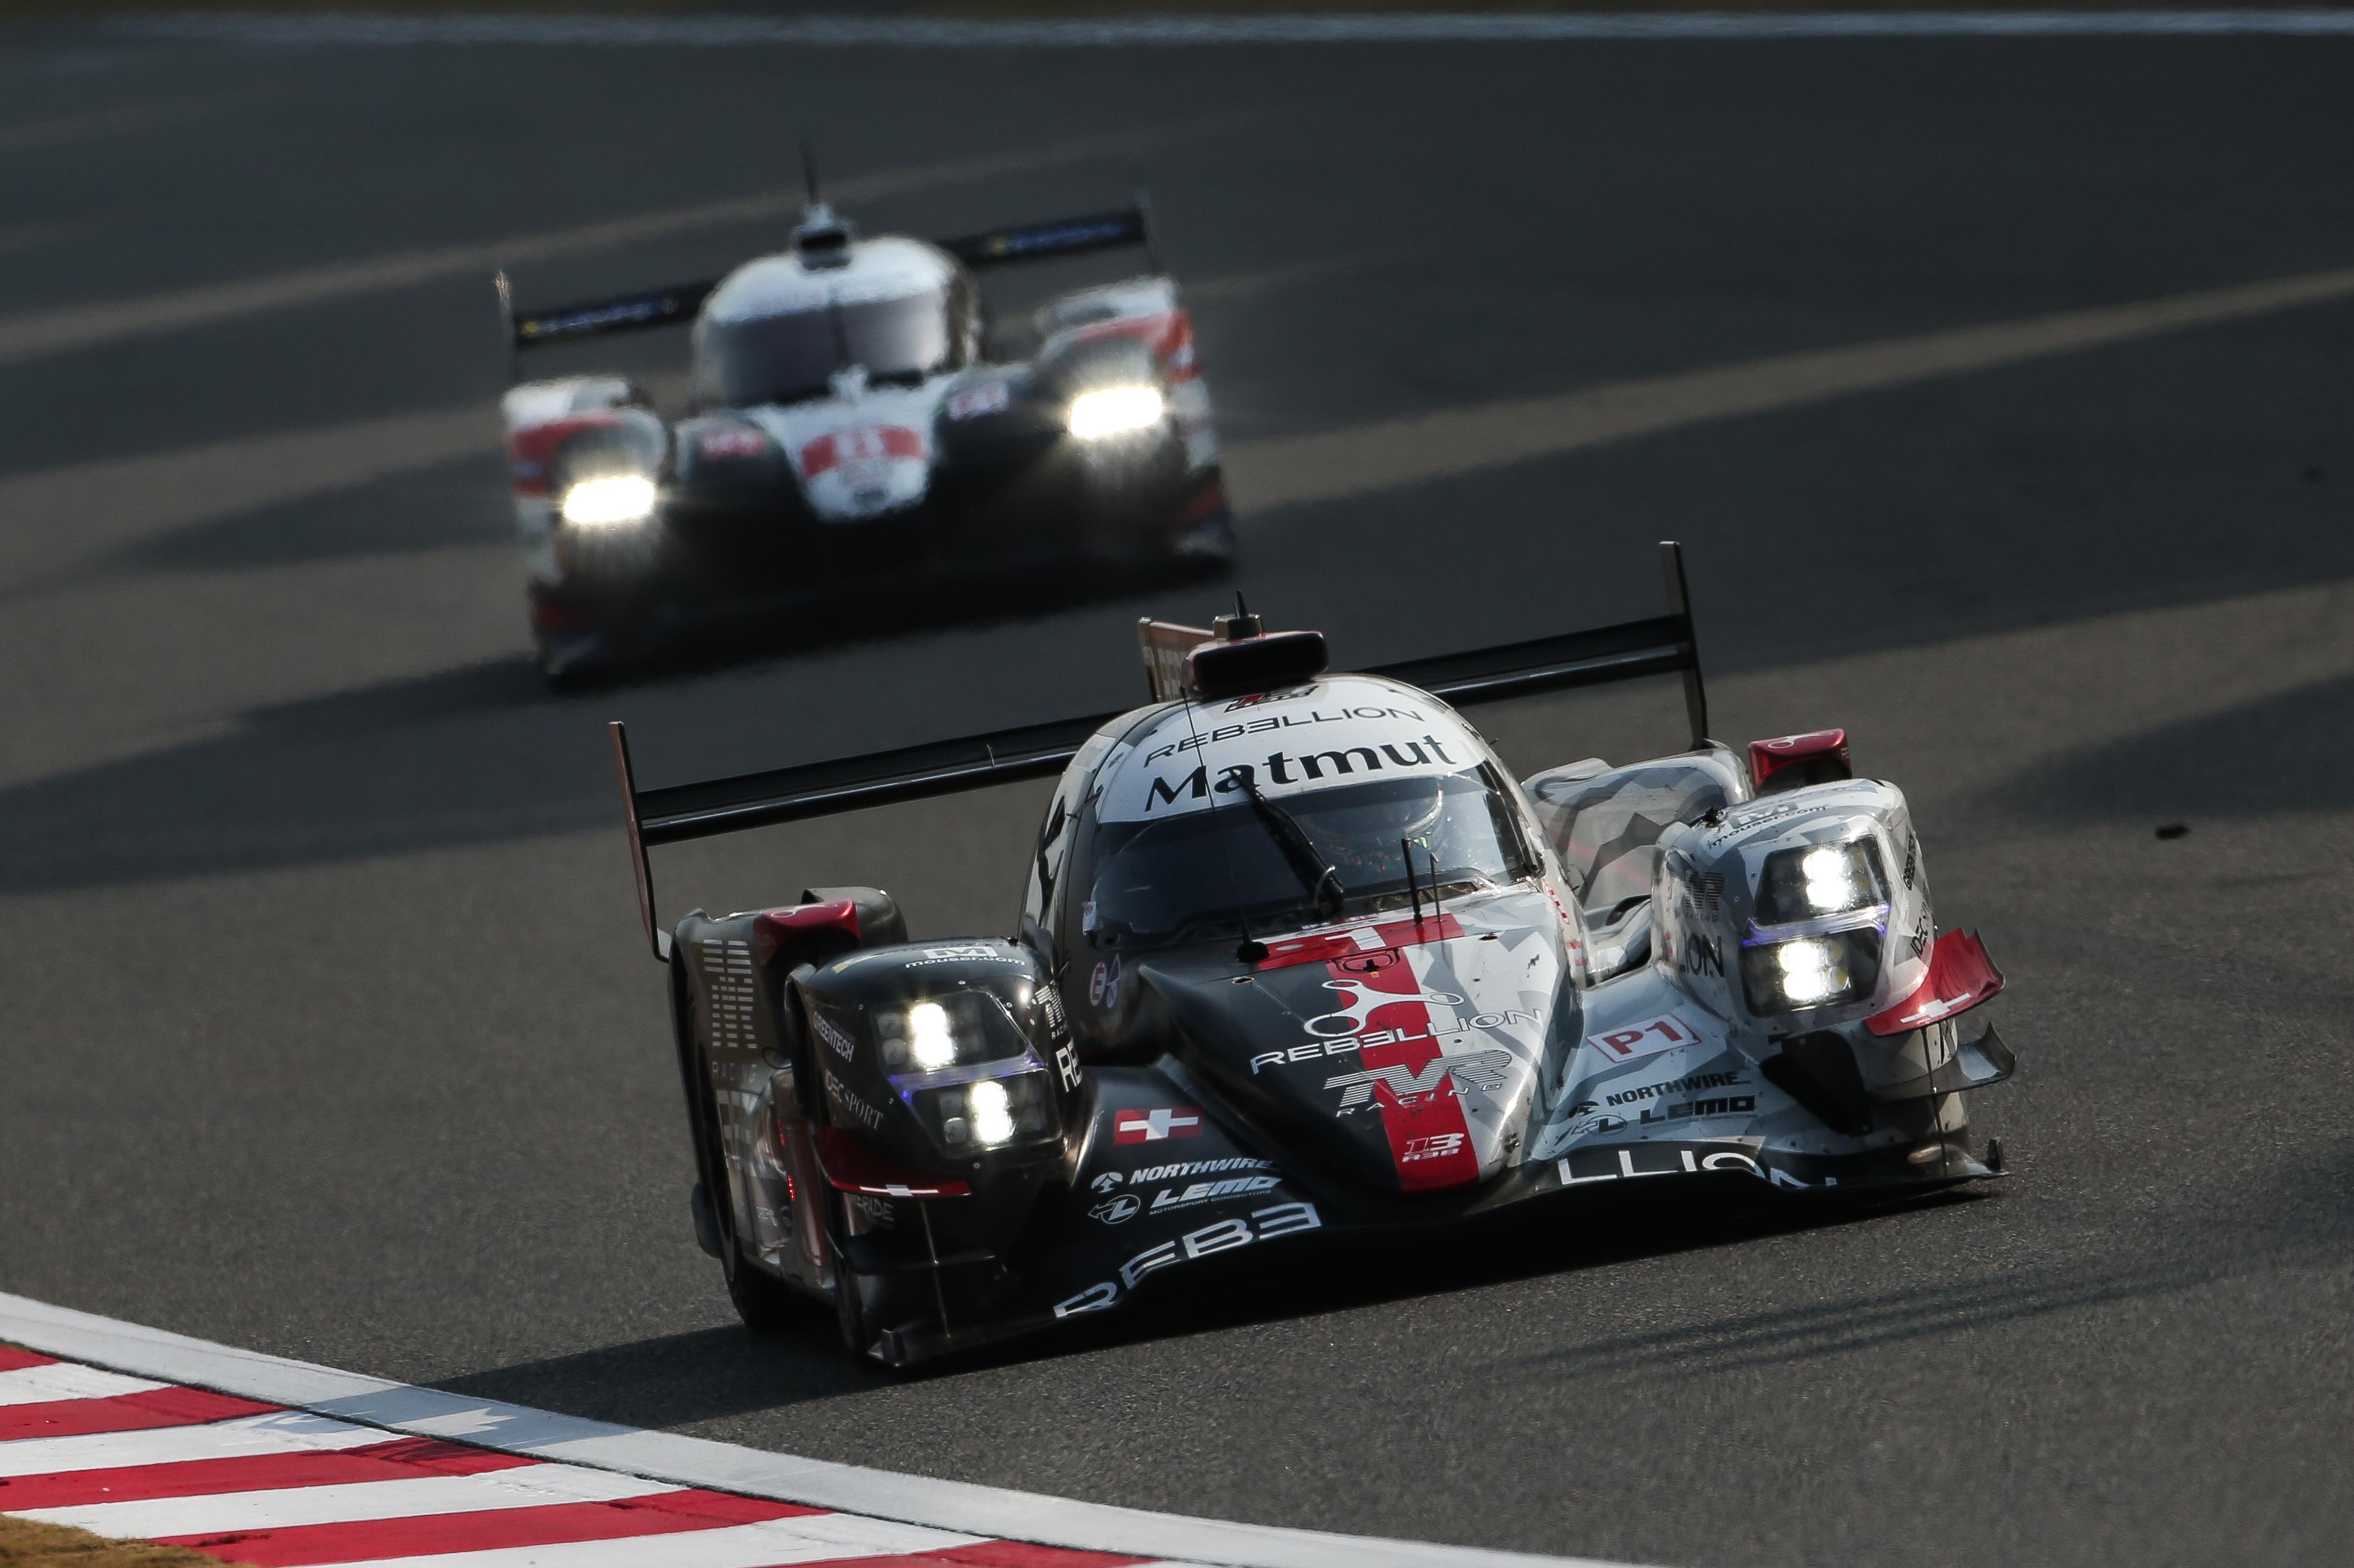 Motor Racing Fia World Endurance Championship Wec Round 3 Shanghai, China